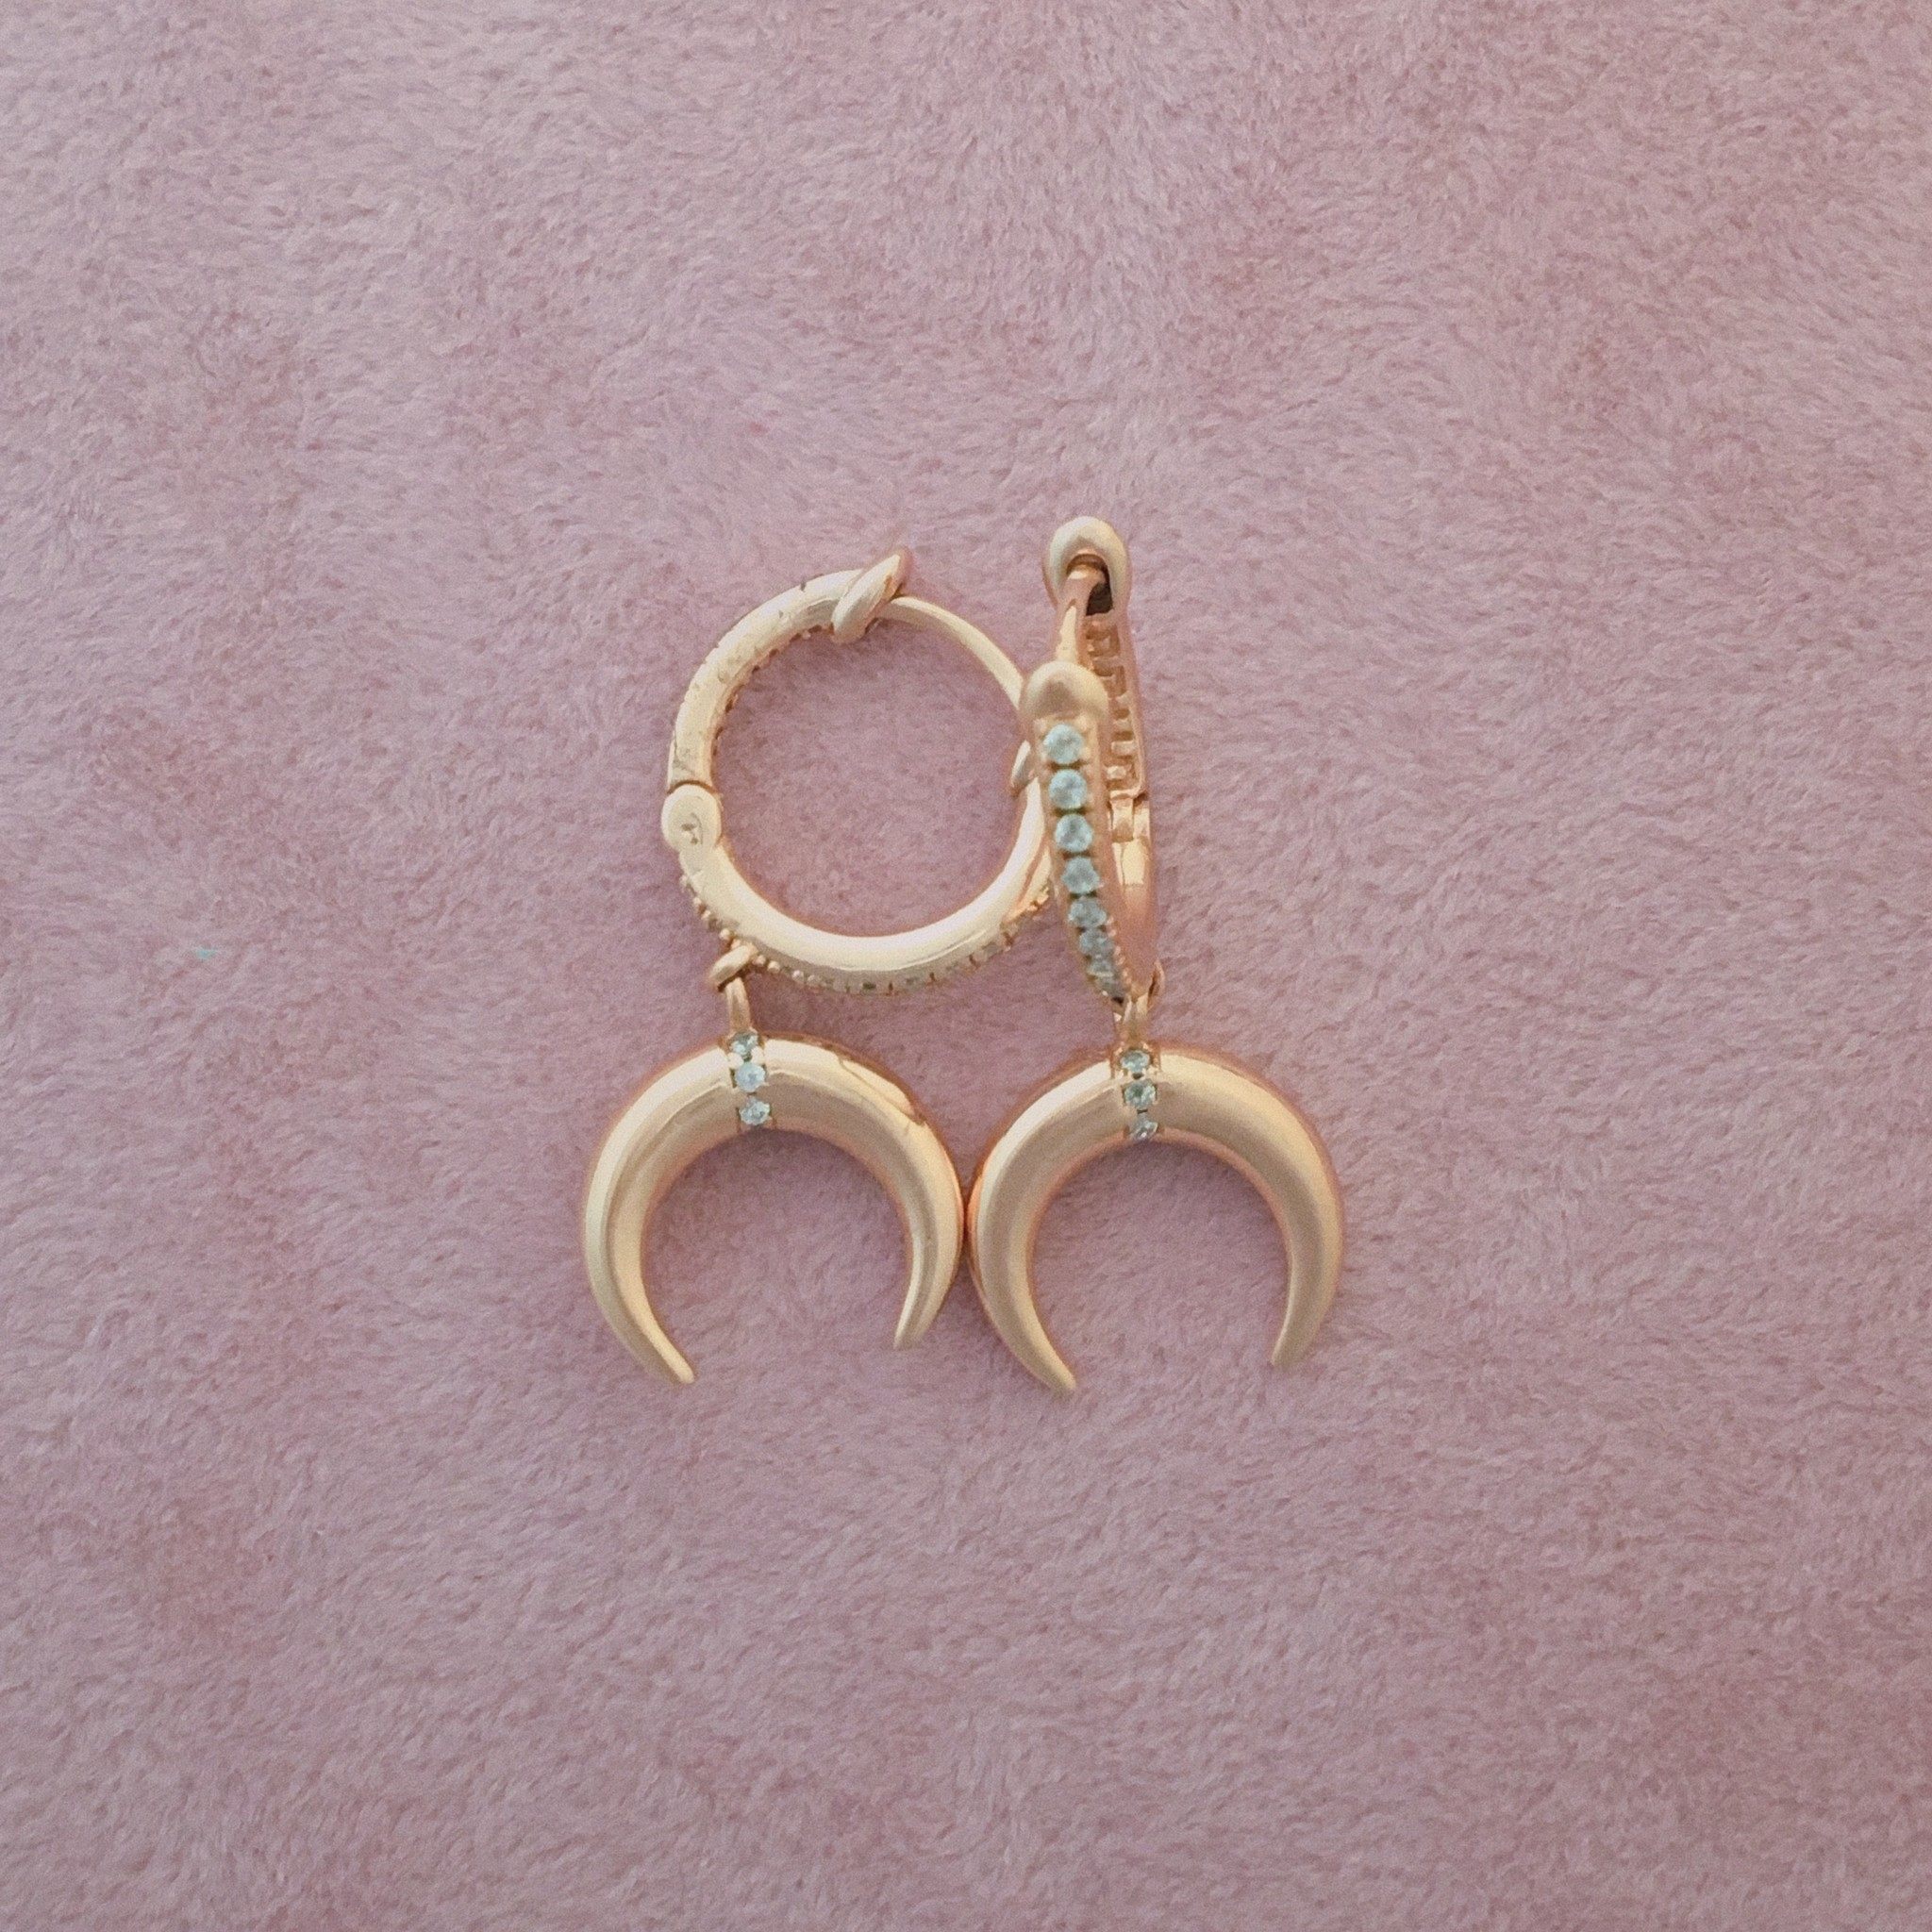 Kurshuni Jewellery Rose Gold Cresent Moon Hoop